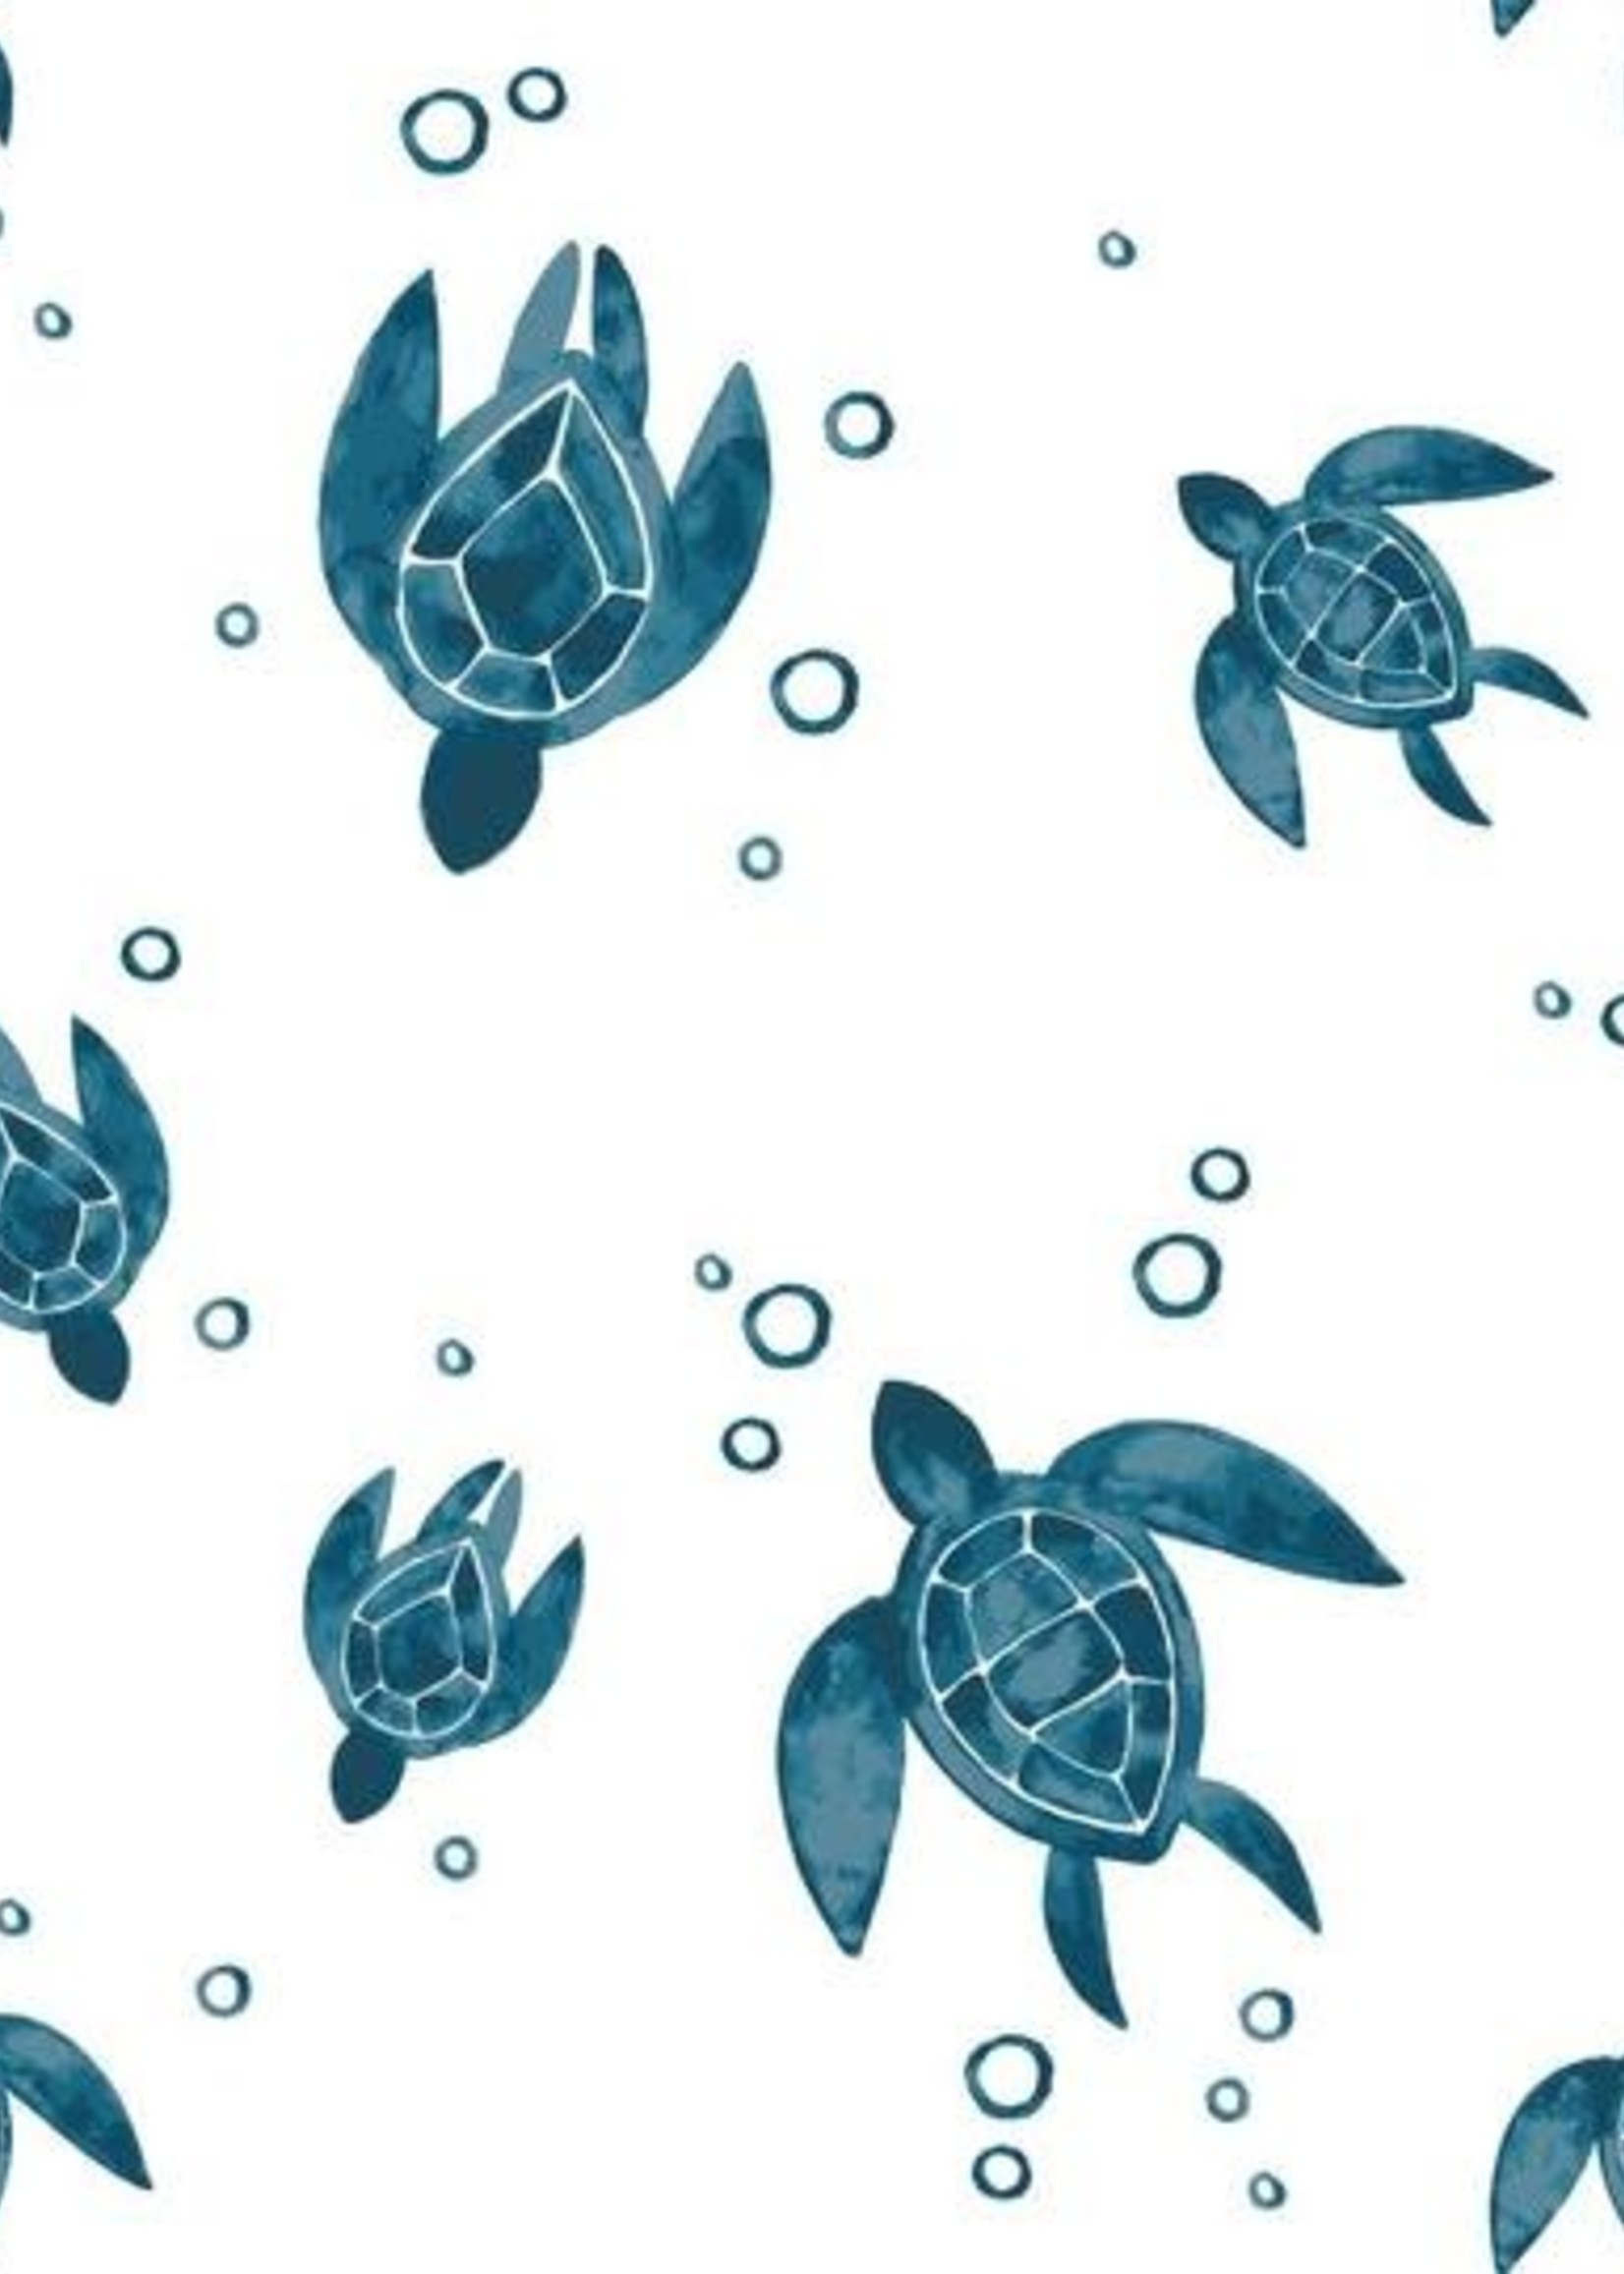 Bebe Au Lait Sea Turtles Oh-So-Soft Muslin Swaddle Blanket